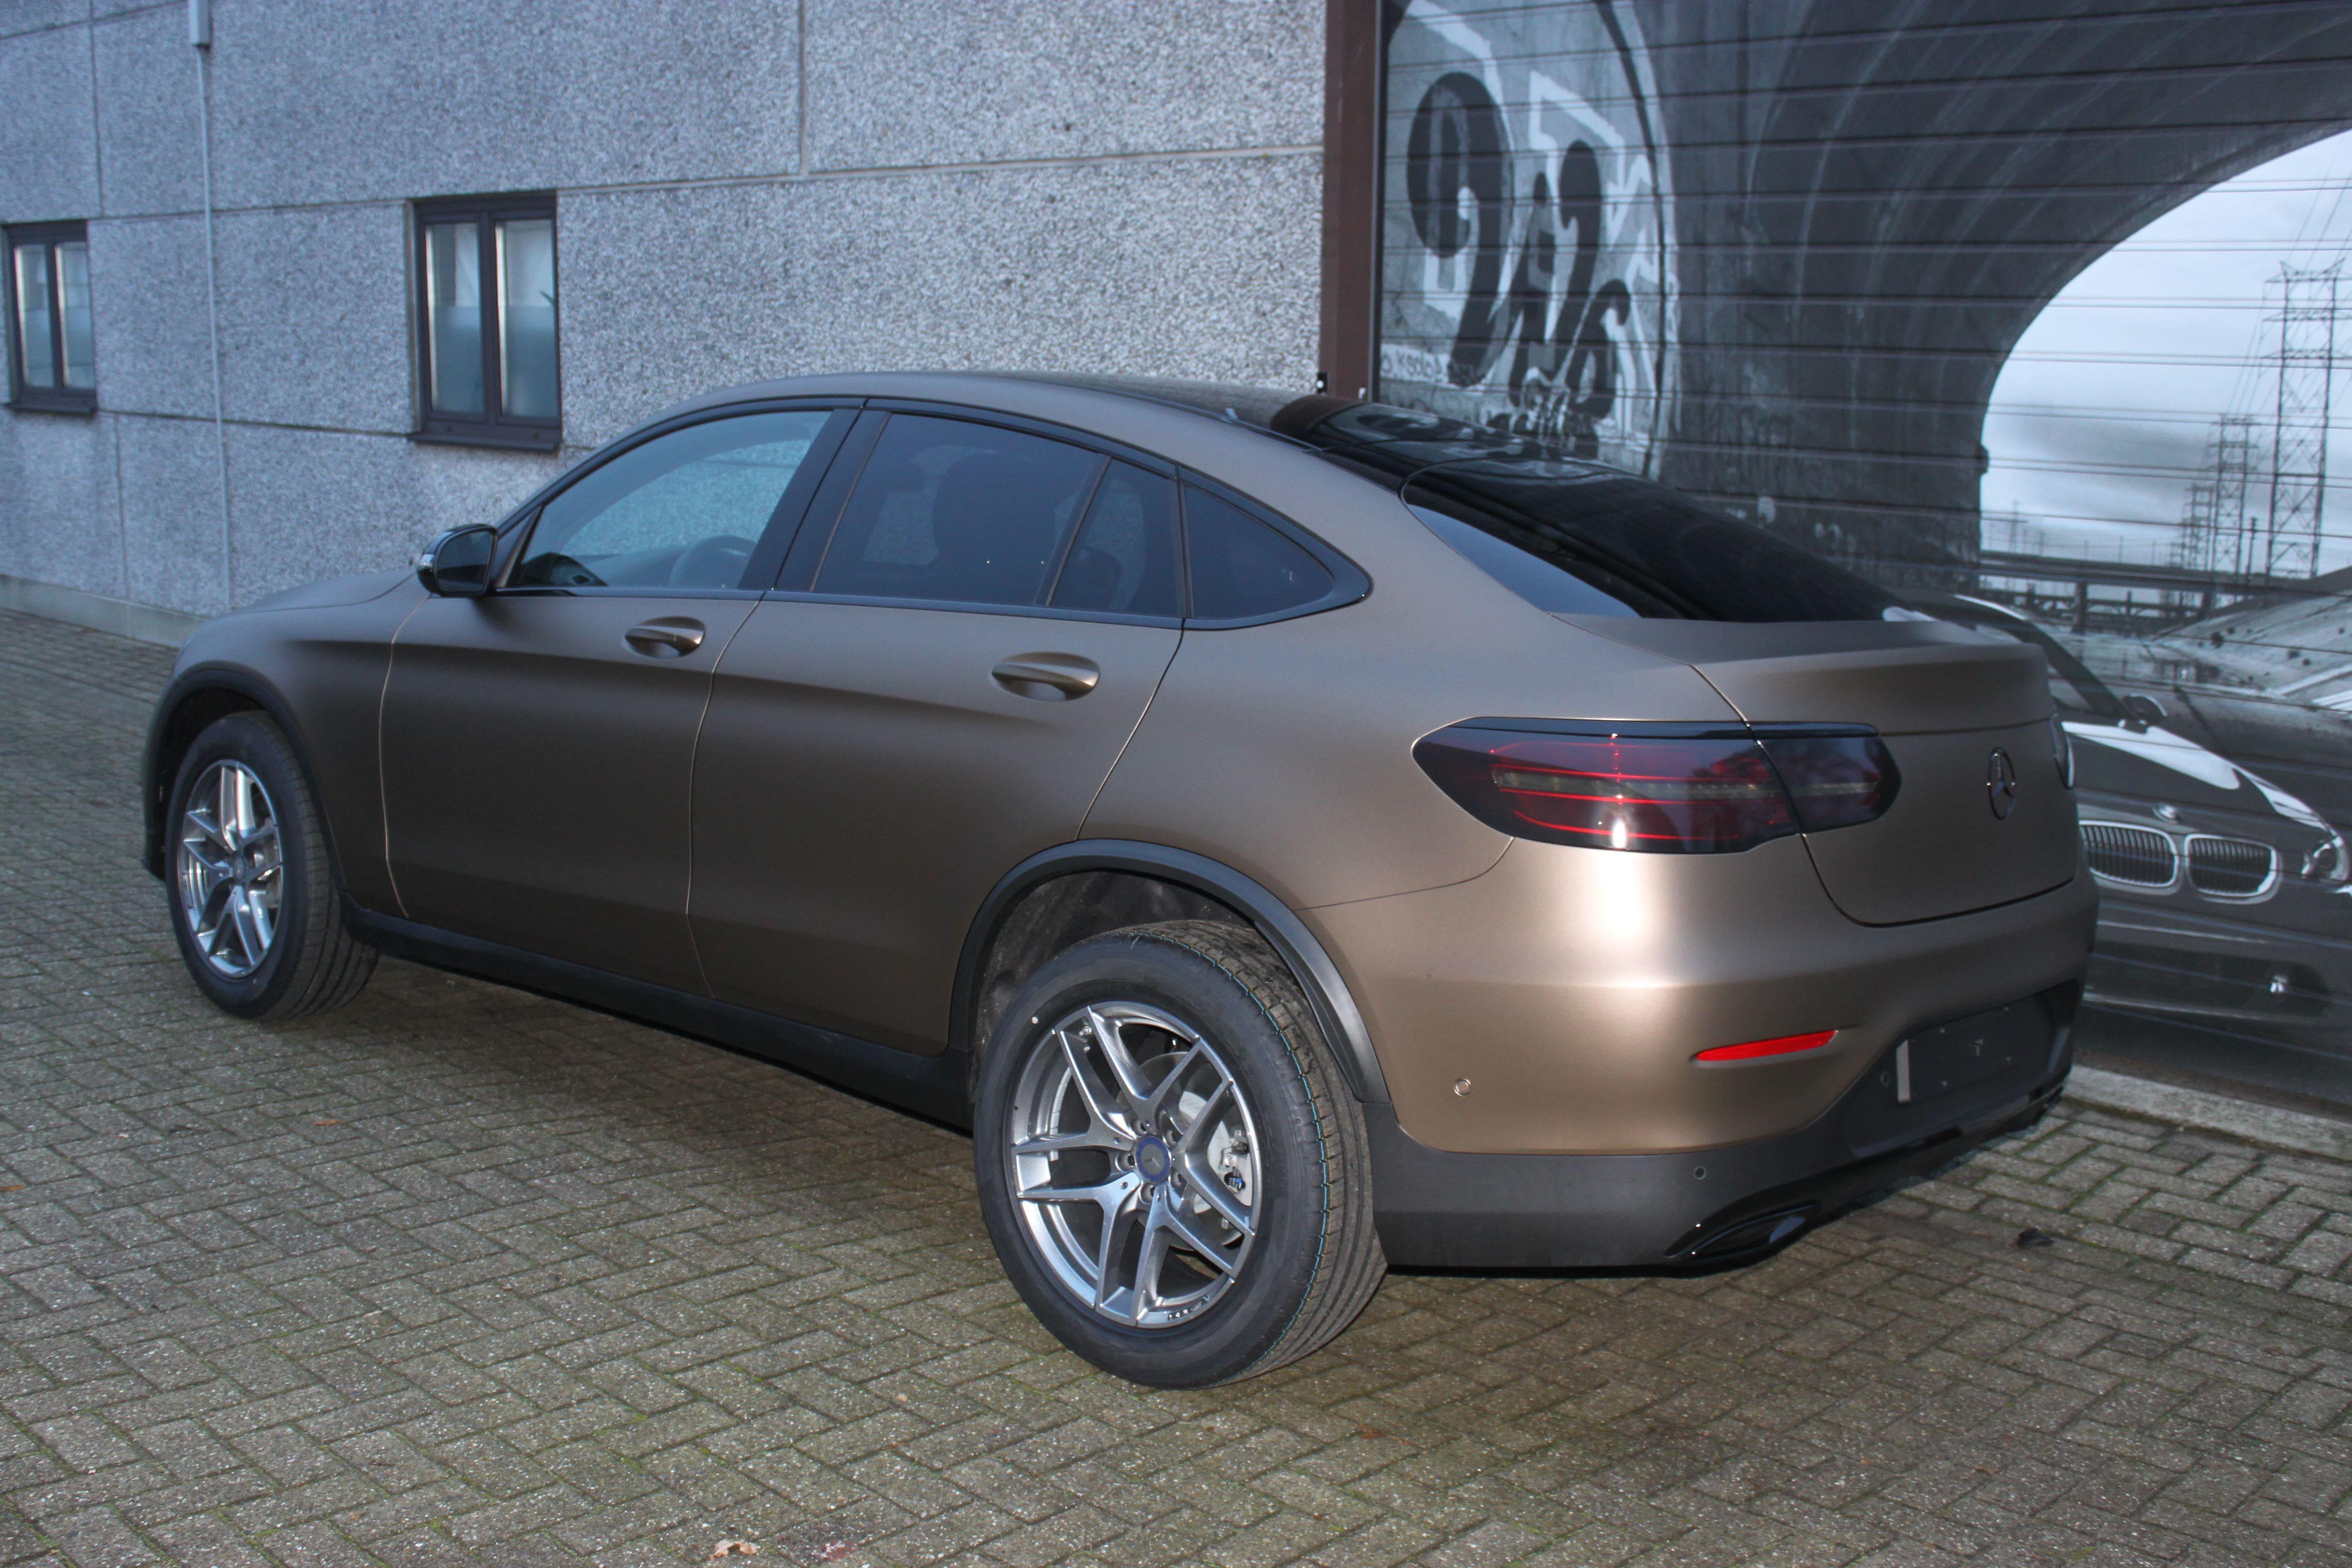 Mercedes GLC Coupe Matte metallic brown, Carwrapping door Wrapmyride.nu Foto-nr:9365, ©2021